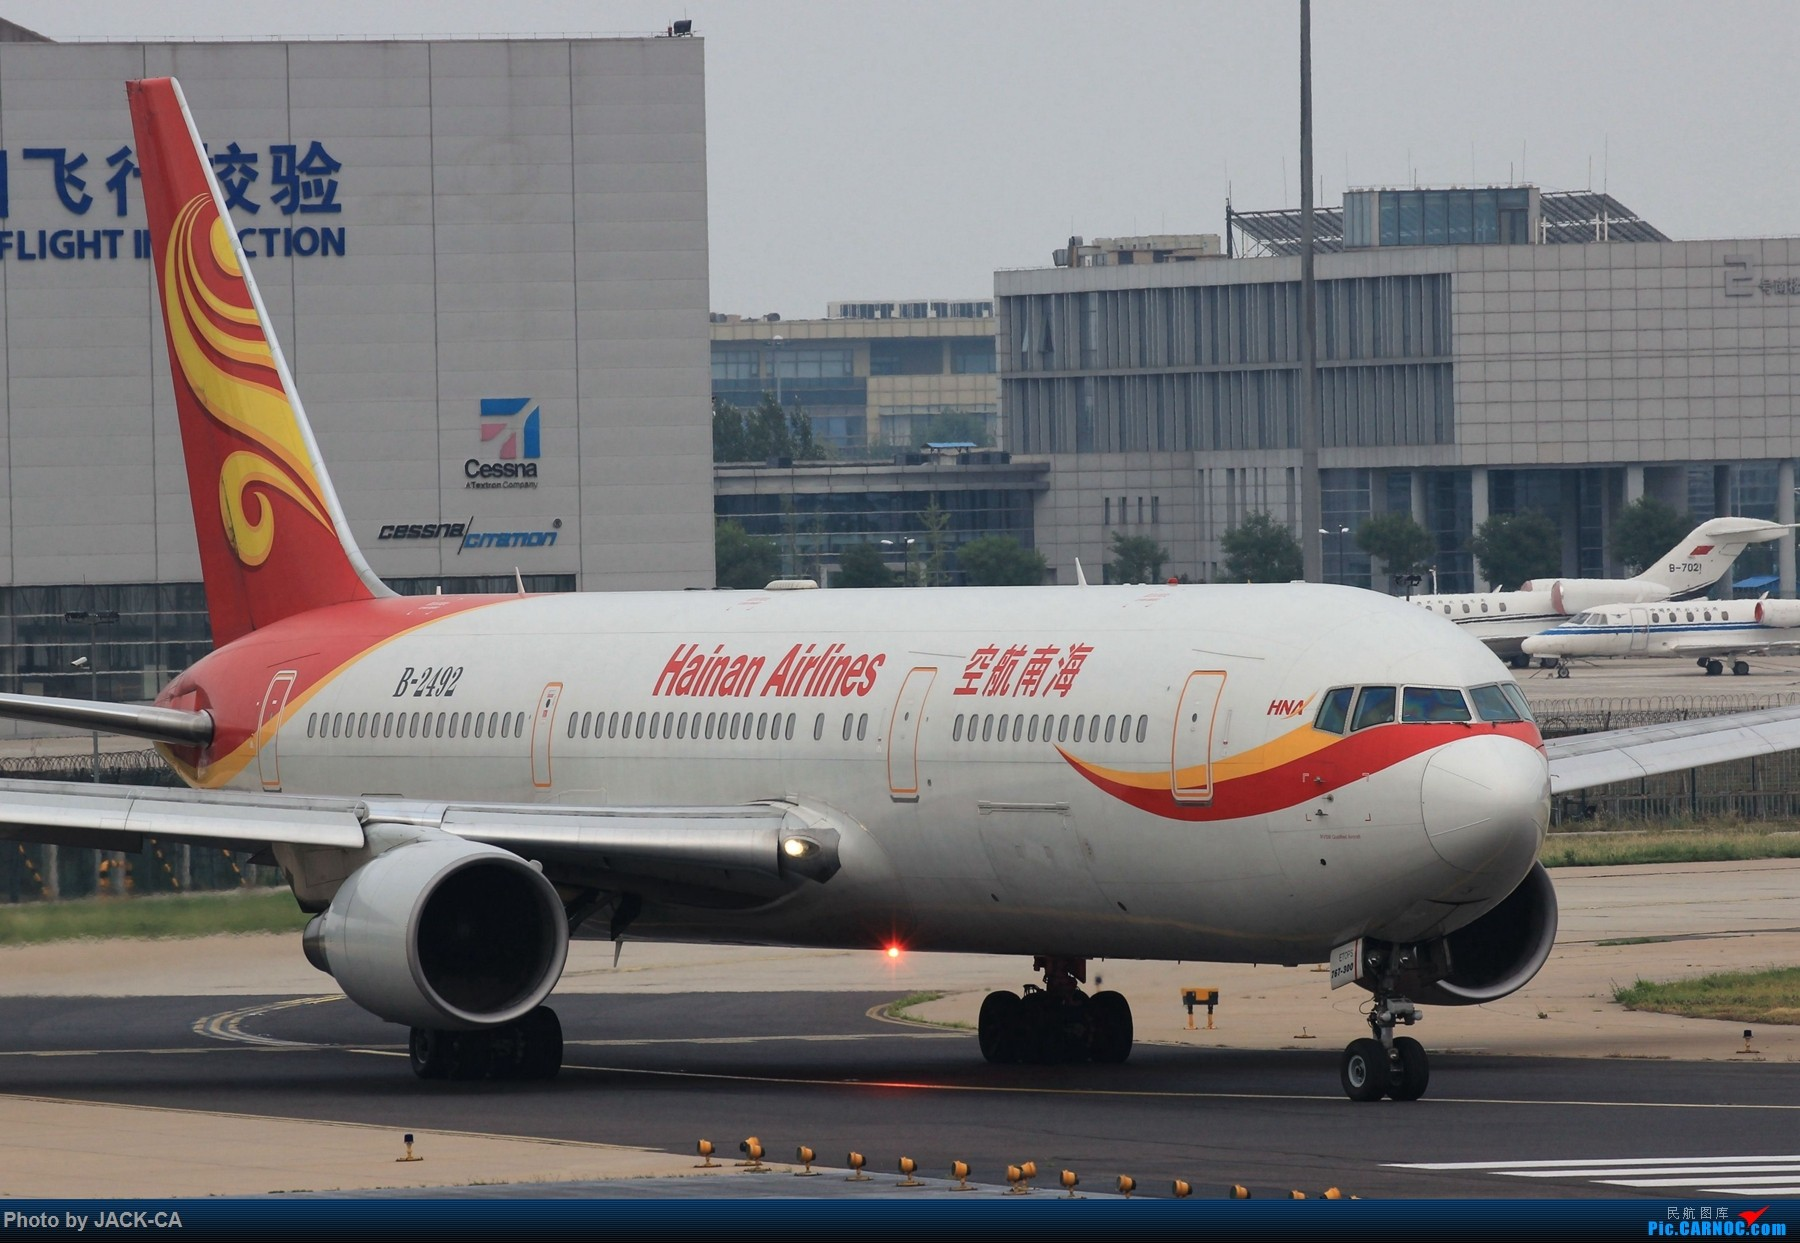 Re:[原创]【飞机1返1】厦航天合+闪灯四大航 ps。。。 BOEING 767-300 B-2492 中国北京首都国际机场